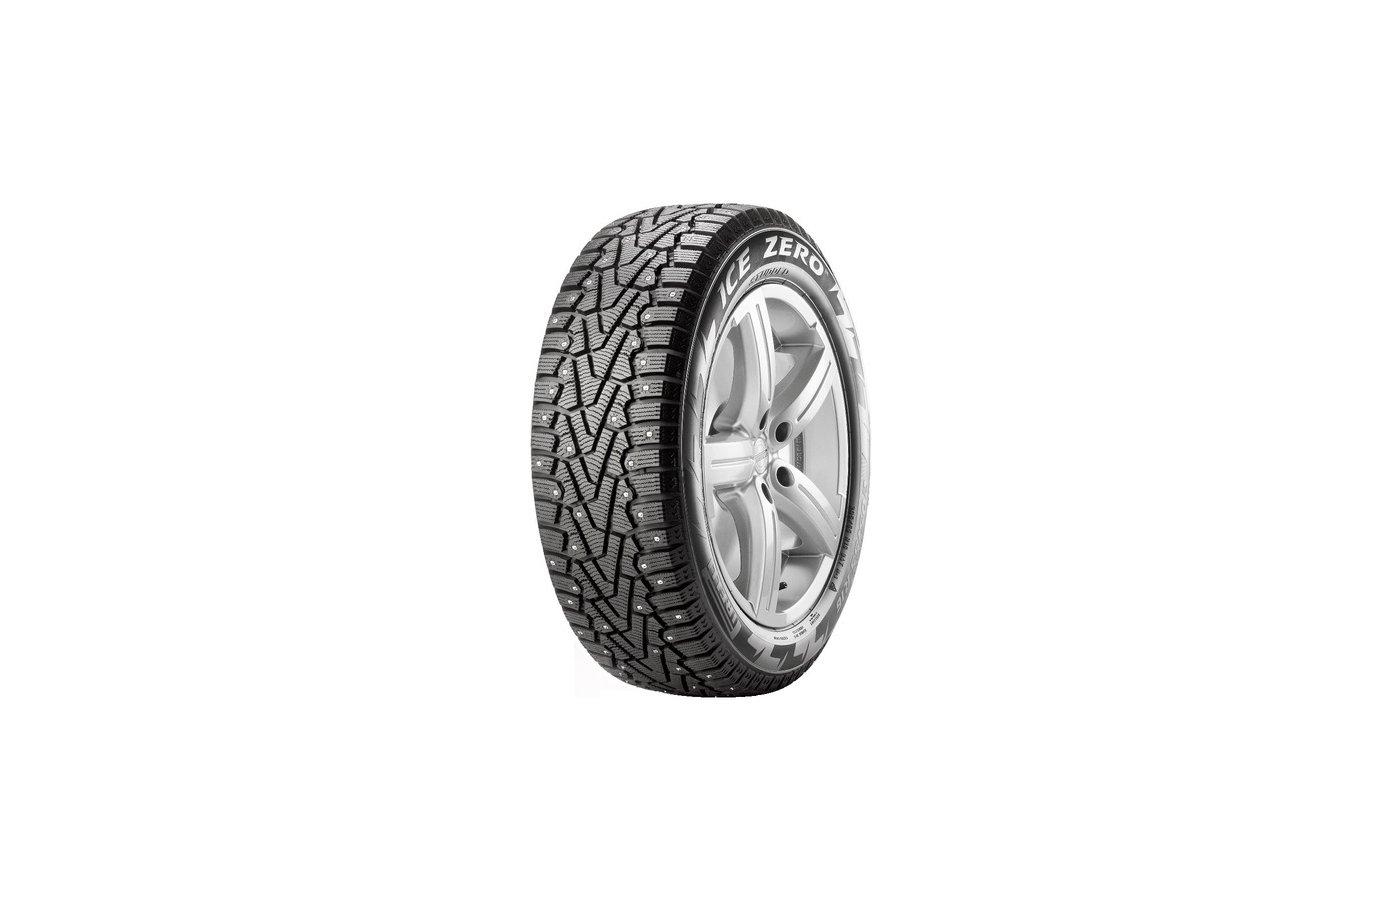 Шина Pirelli Winter Ice Zero 255/55 R18 TL 109H XL шип